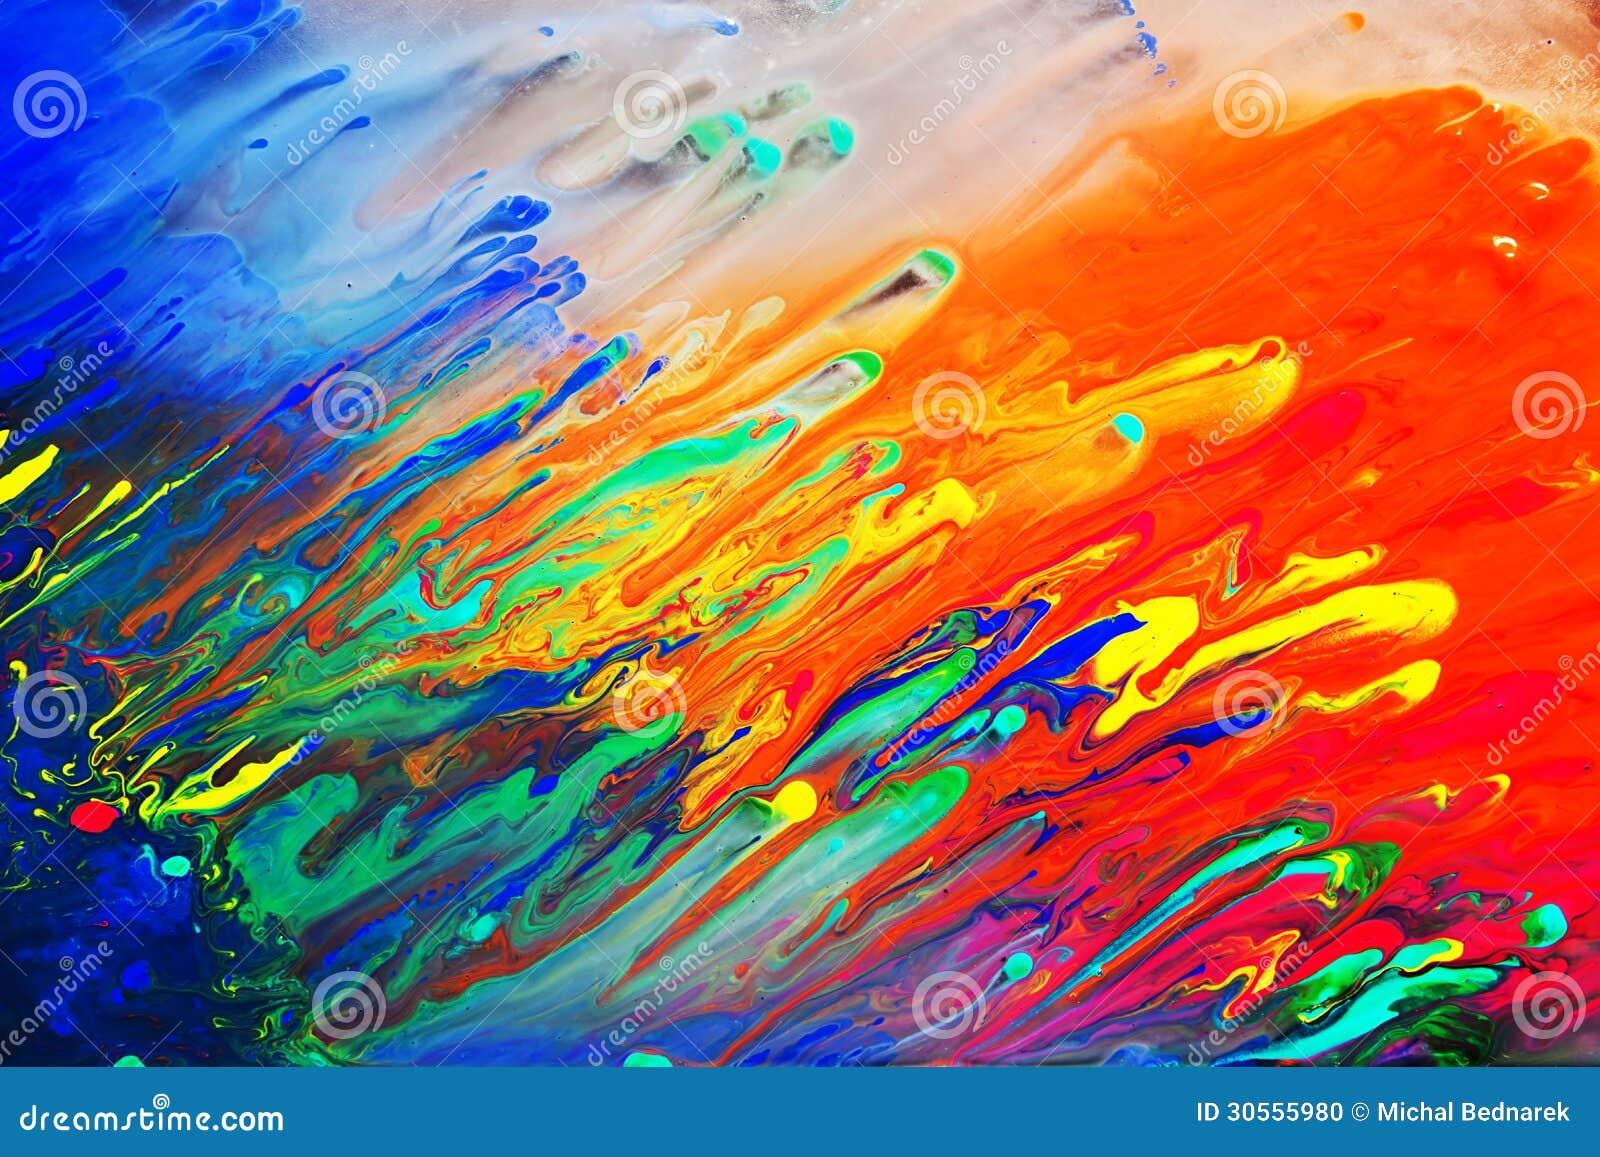 Pittura acrilica astratta variopinta